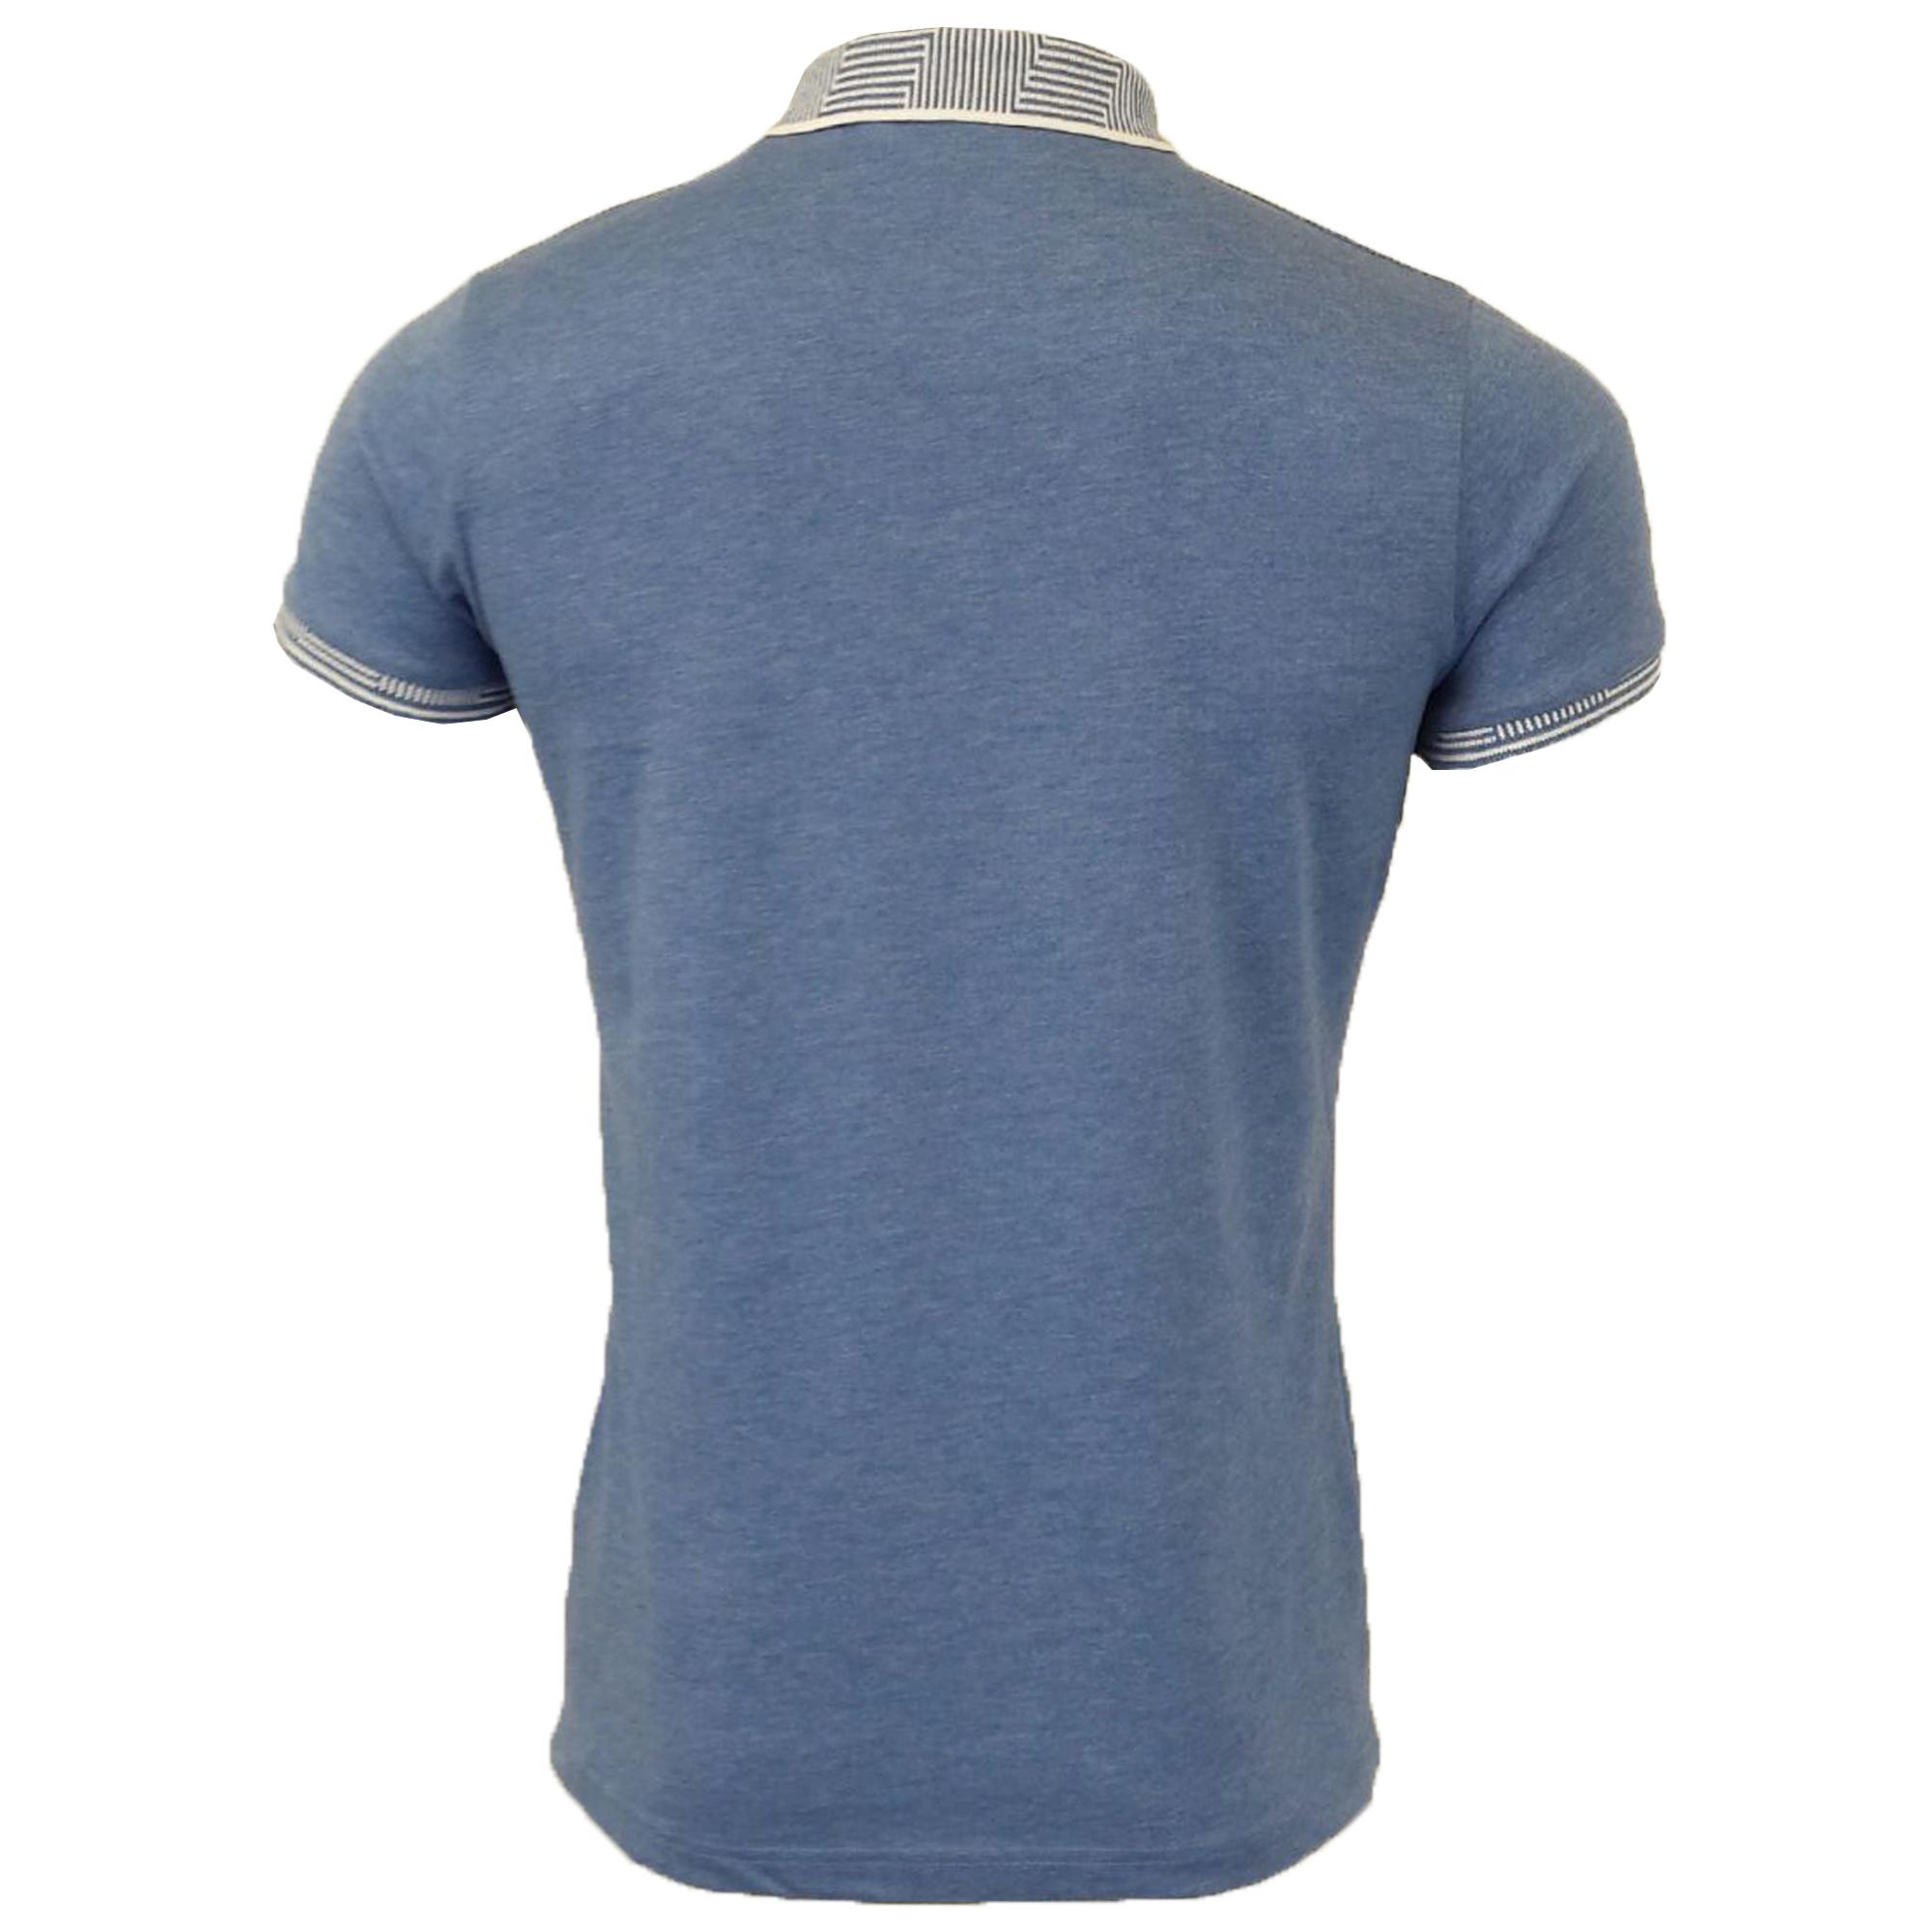 Mens-Polo-T-Shirt-Brave-Soul-Short-Sleeved-Cotton-GLOVER-Collared-KHALIFA-Summer thumbnail 15